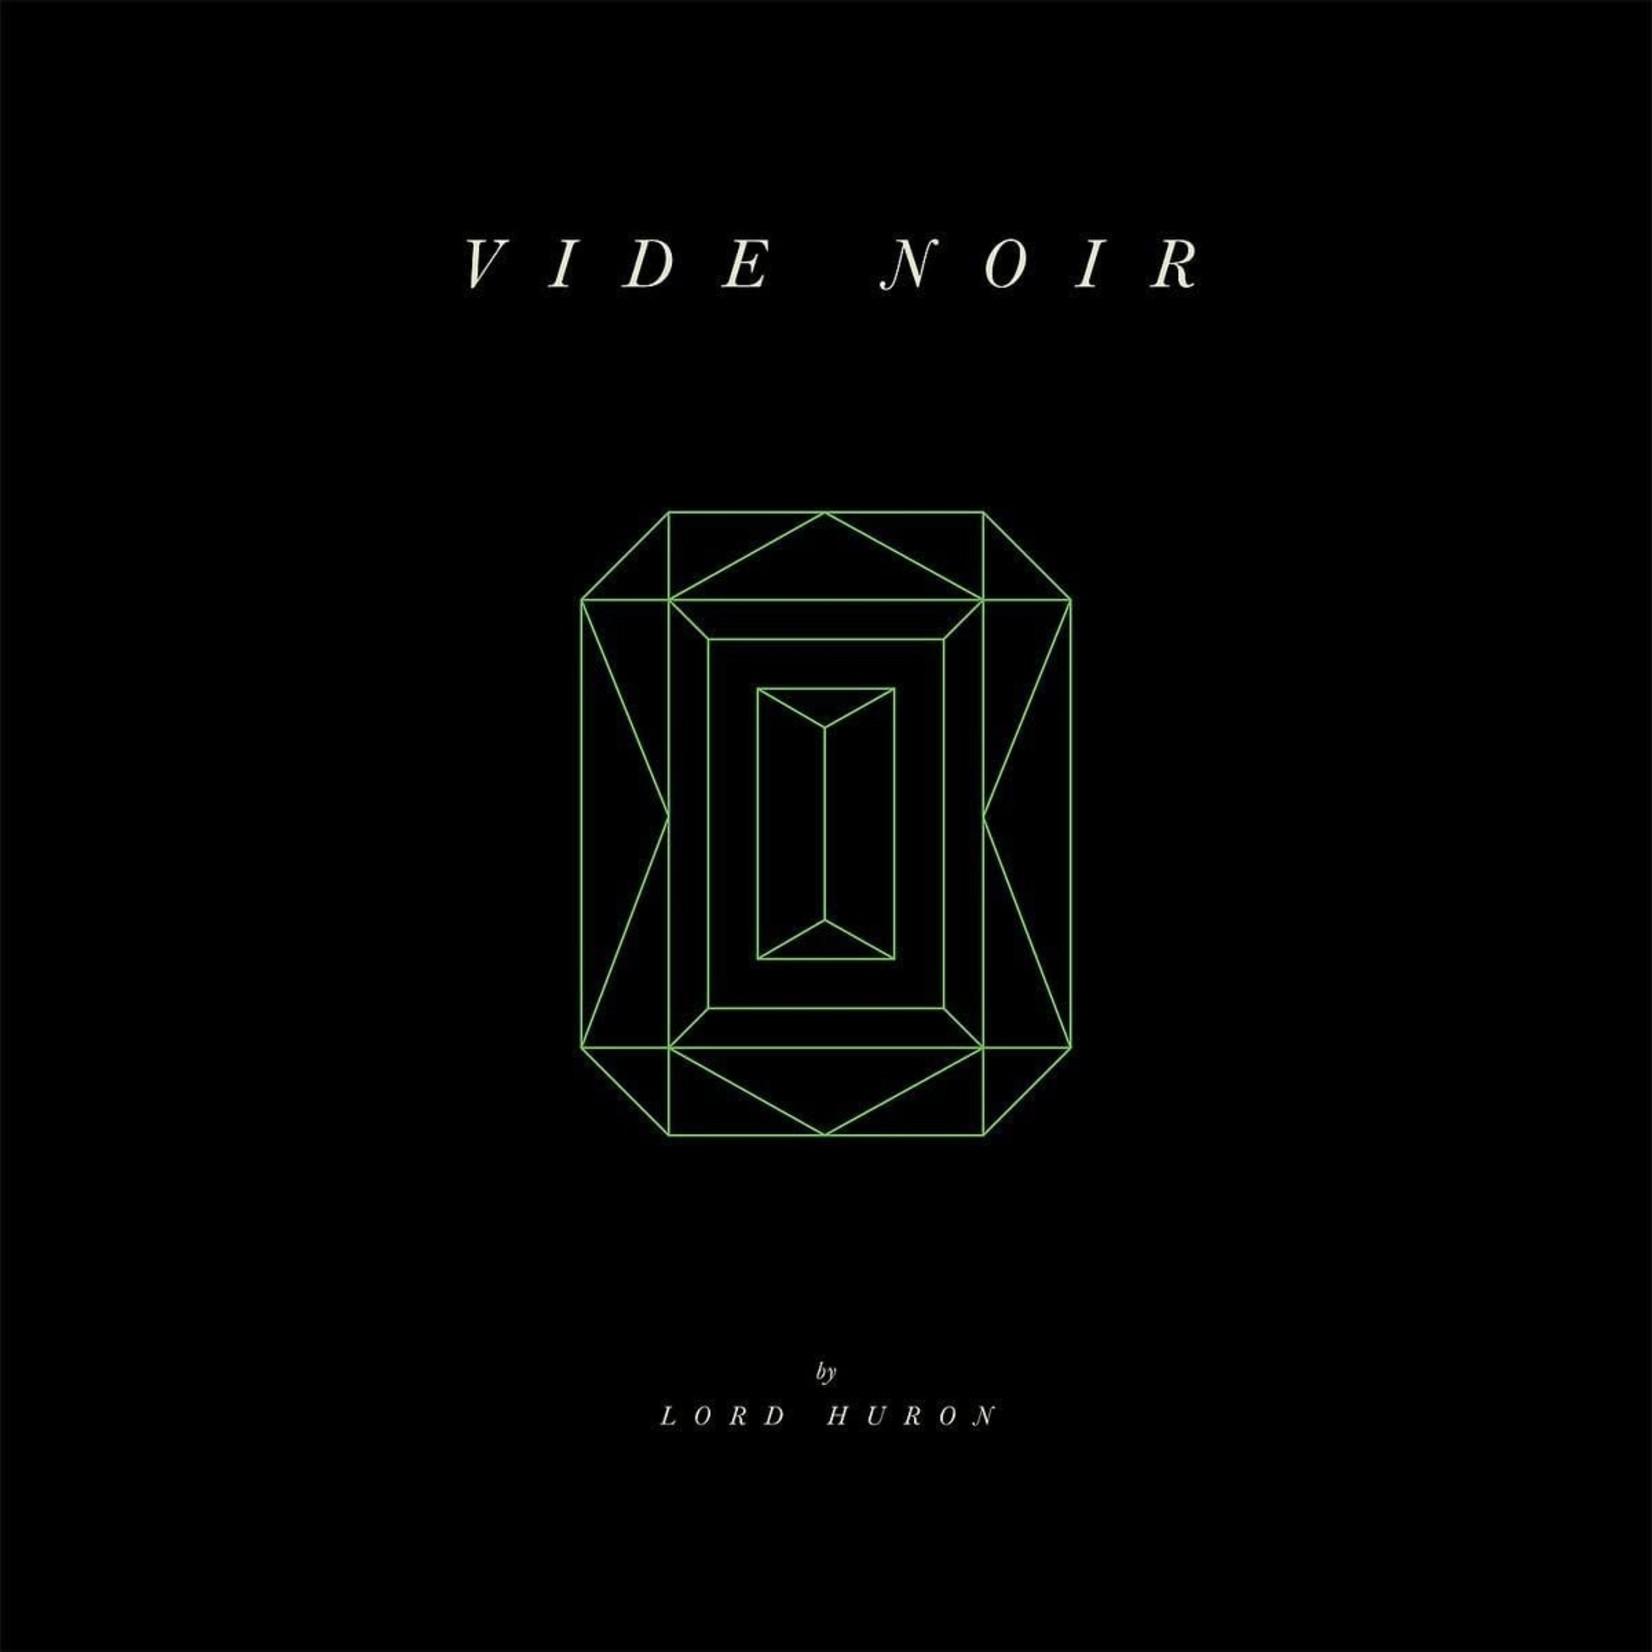 Lord Huron - Vide Noir